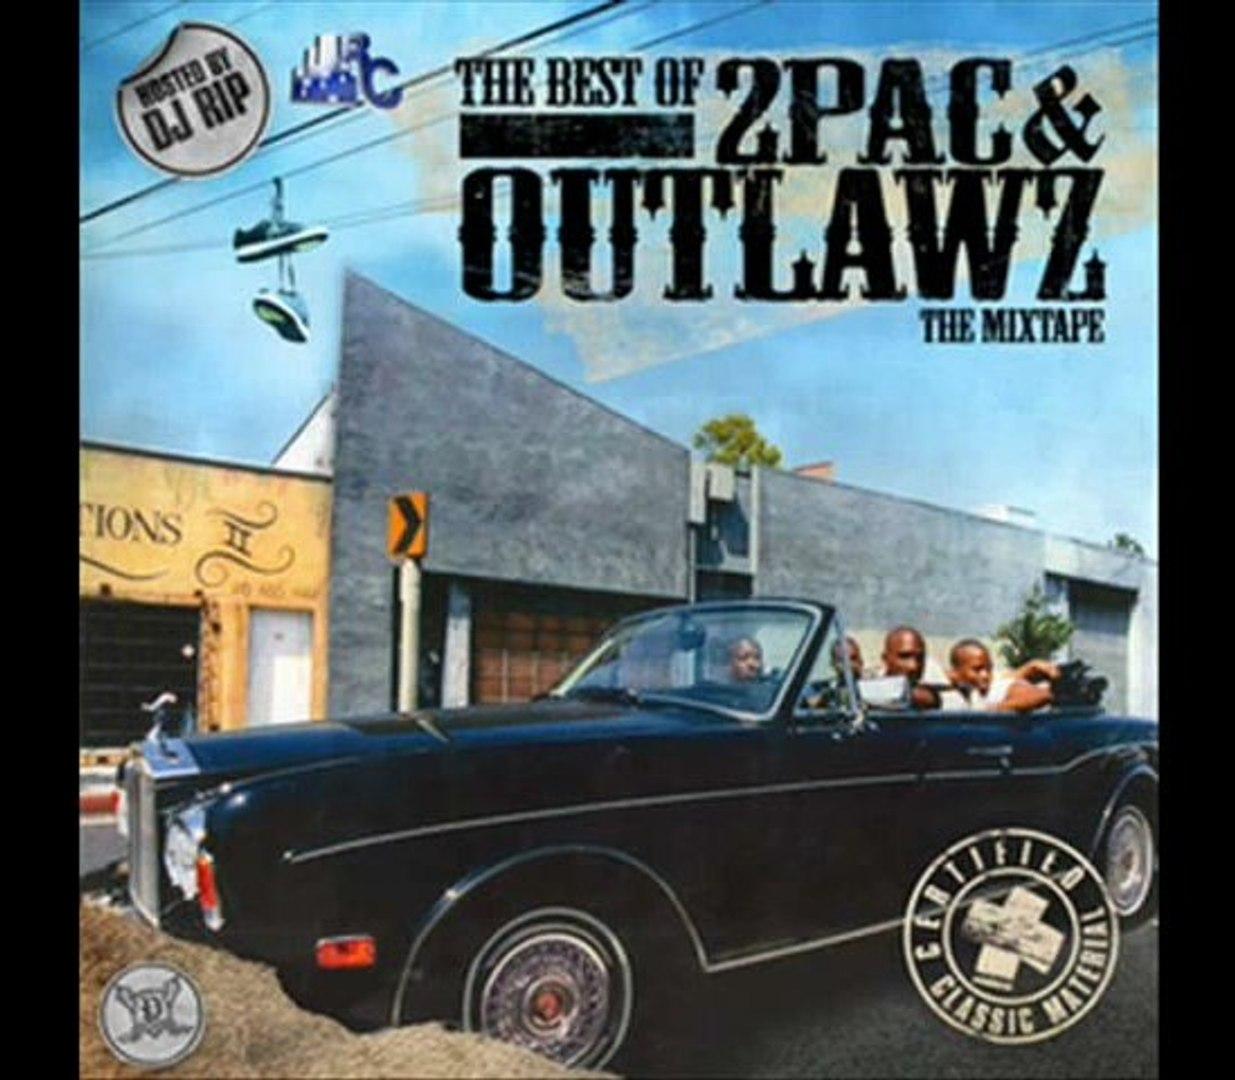 Hot G Funk in the Mix  - Tupac ft. Outlawz. (lexinho remix)